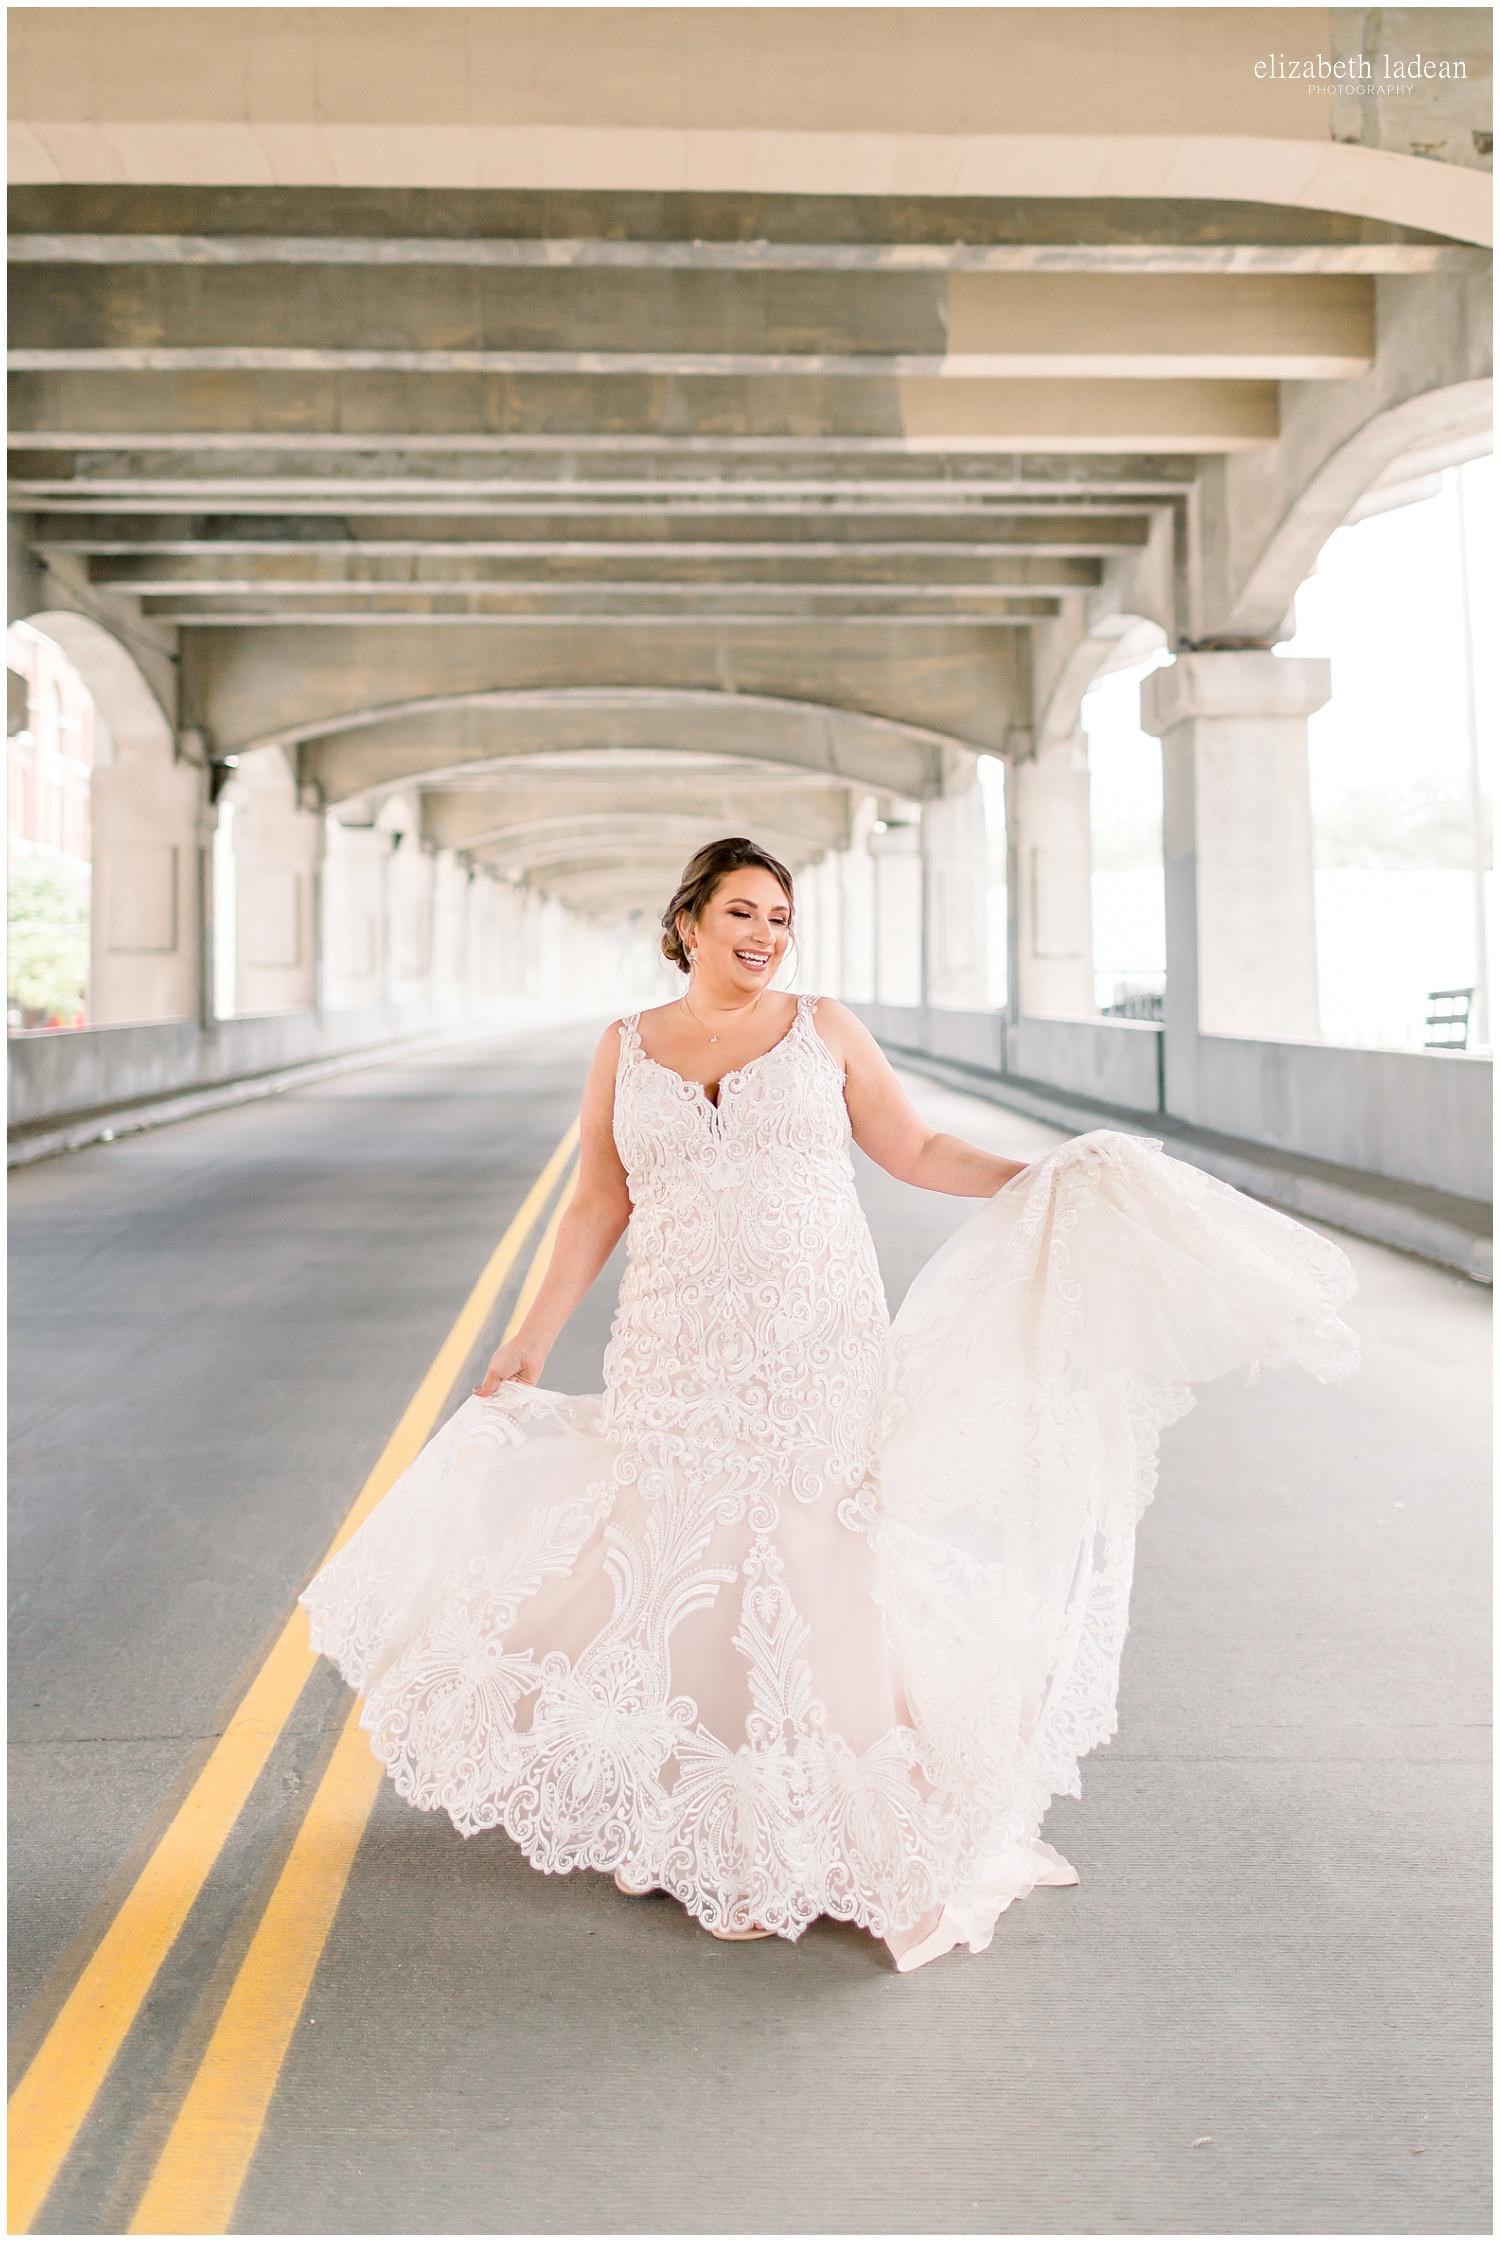 -Adventurous-Kansas-City-Worldwide-Wedding-Photographer-2018-elizabeth-ladean-photography-photo_3238.jpg